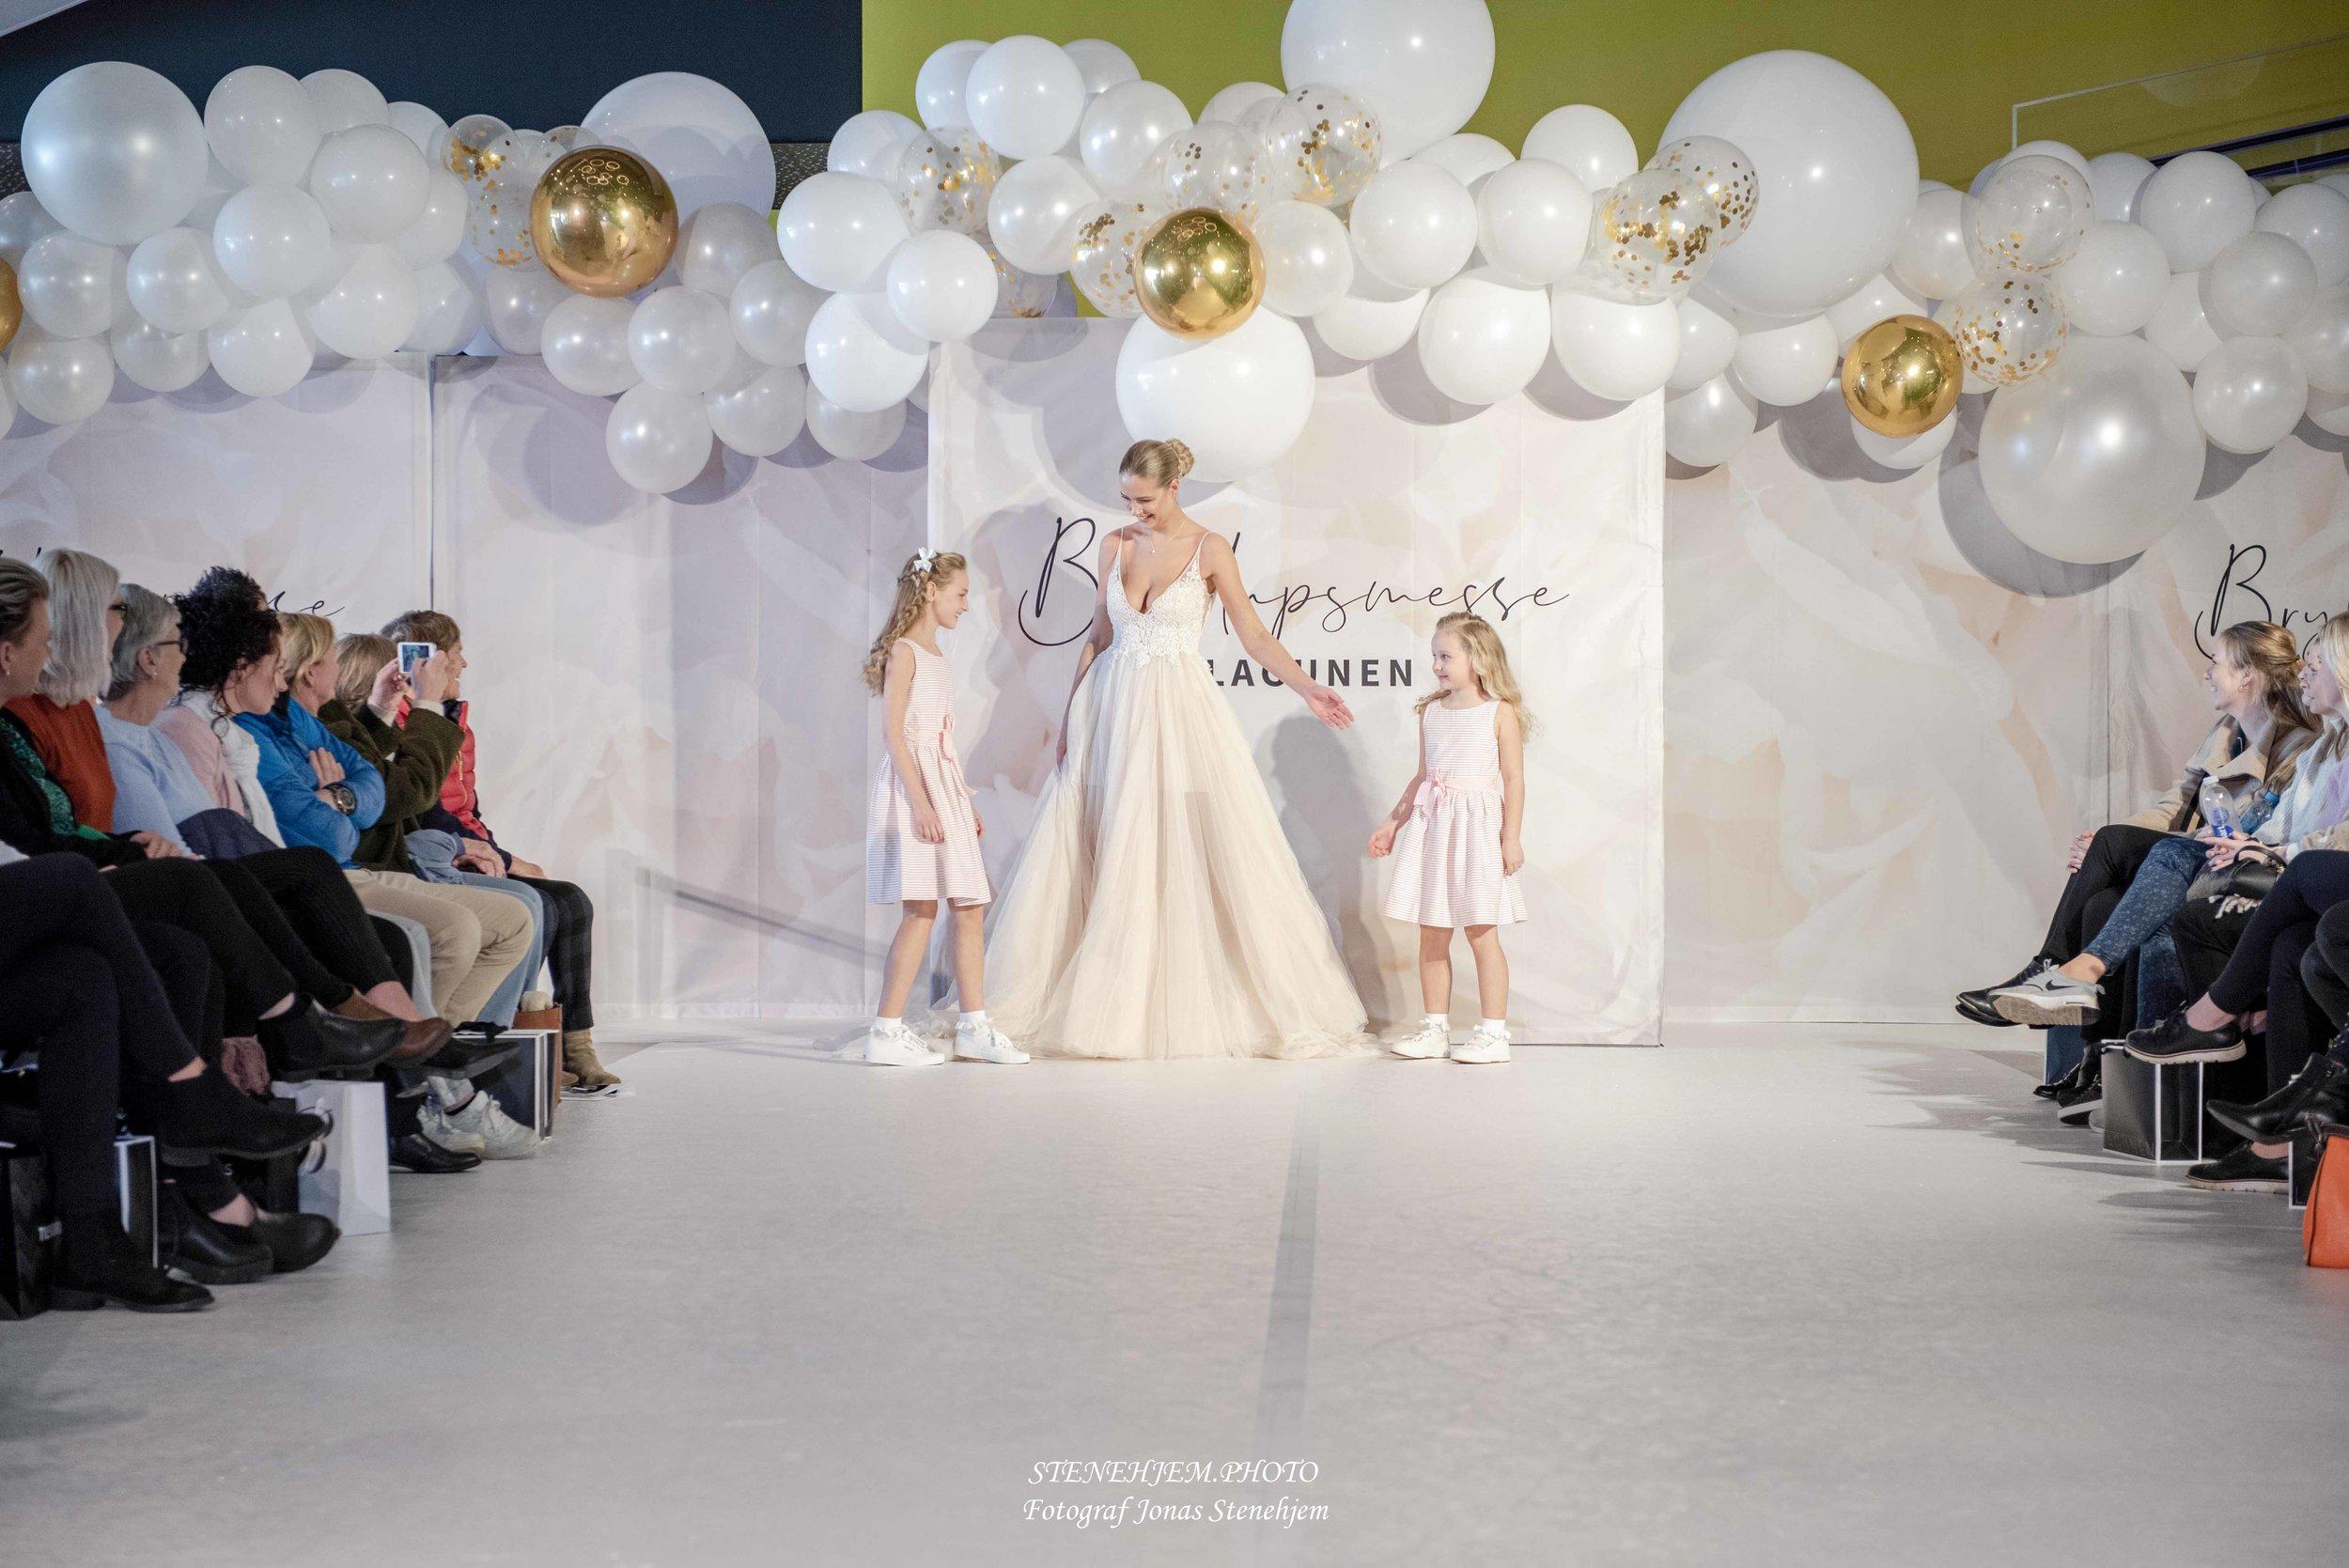 Bryllupsmesse_Lagunen_mittaltweddingfair__088.jpg